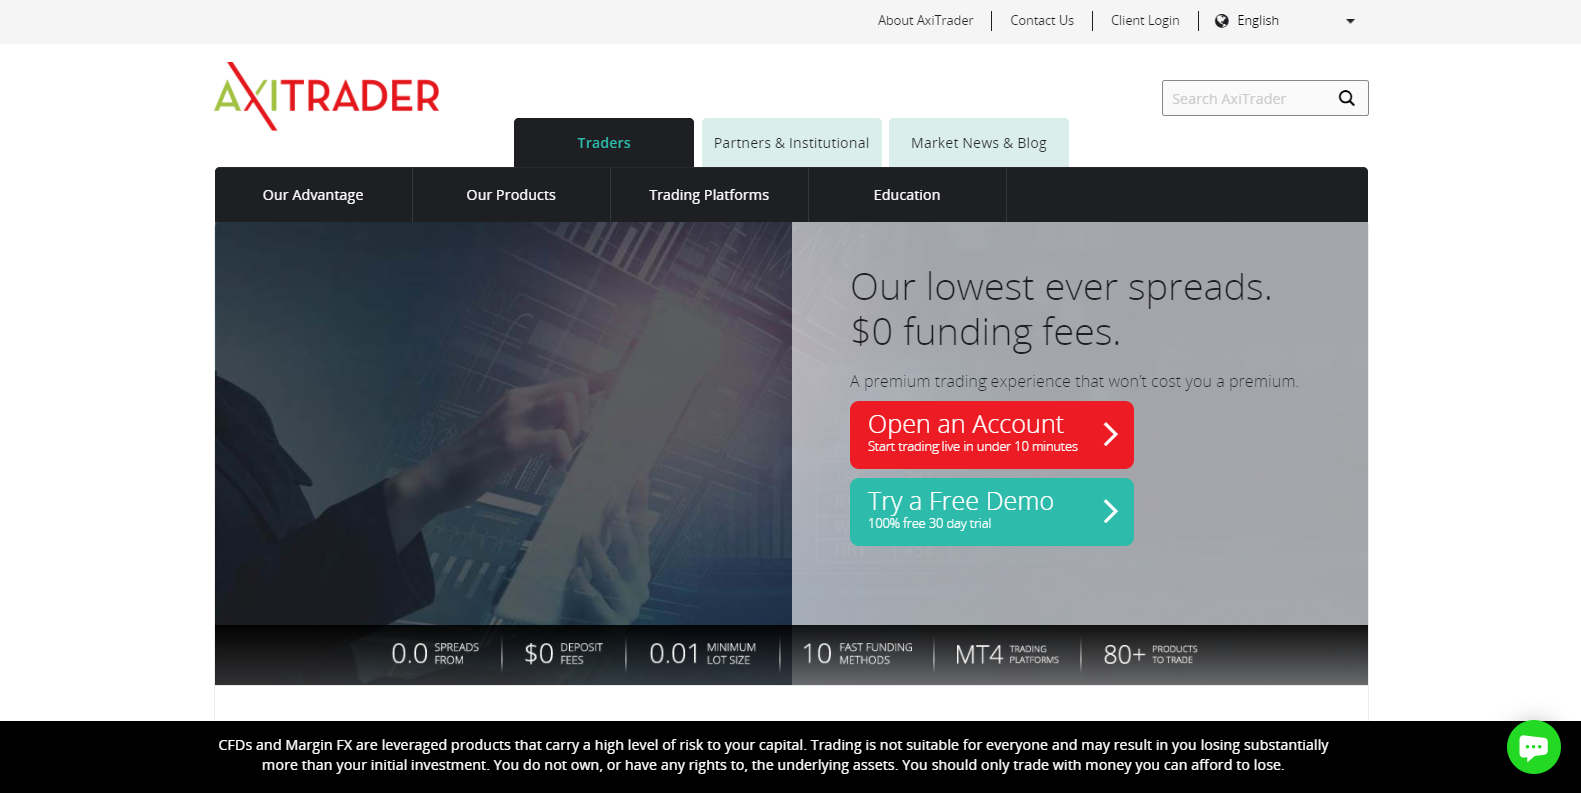 AxiTrader homepage